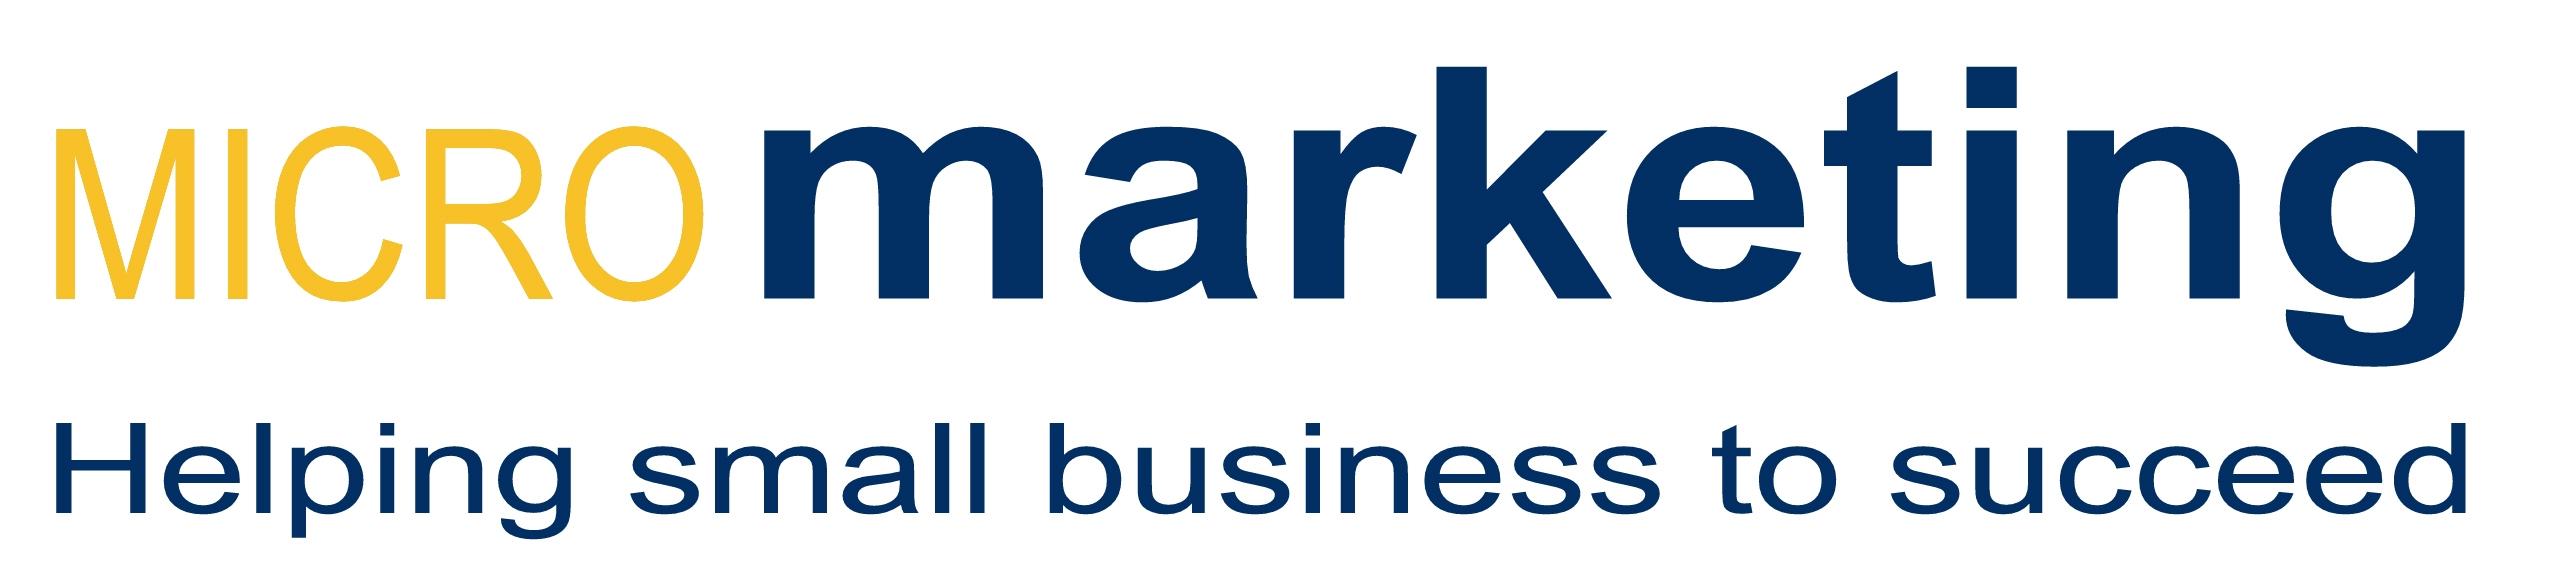 micromarketing_logo